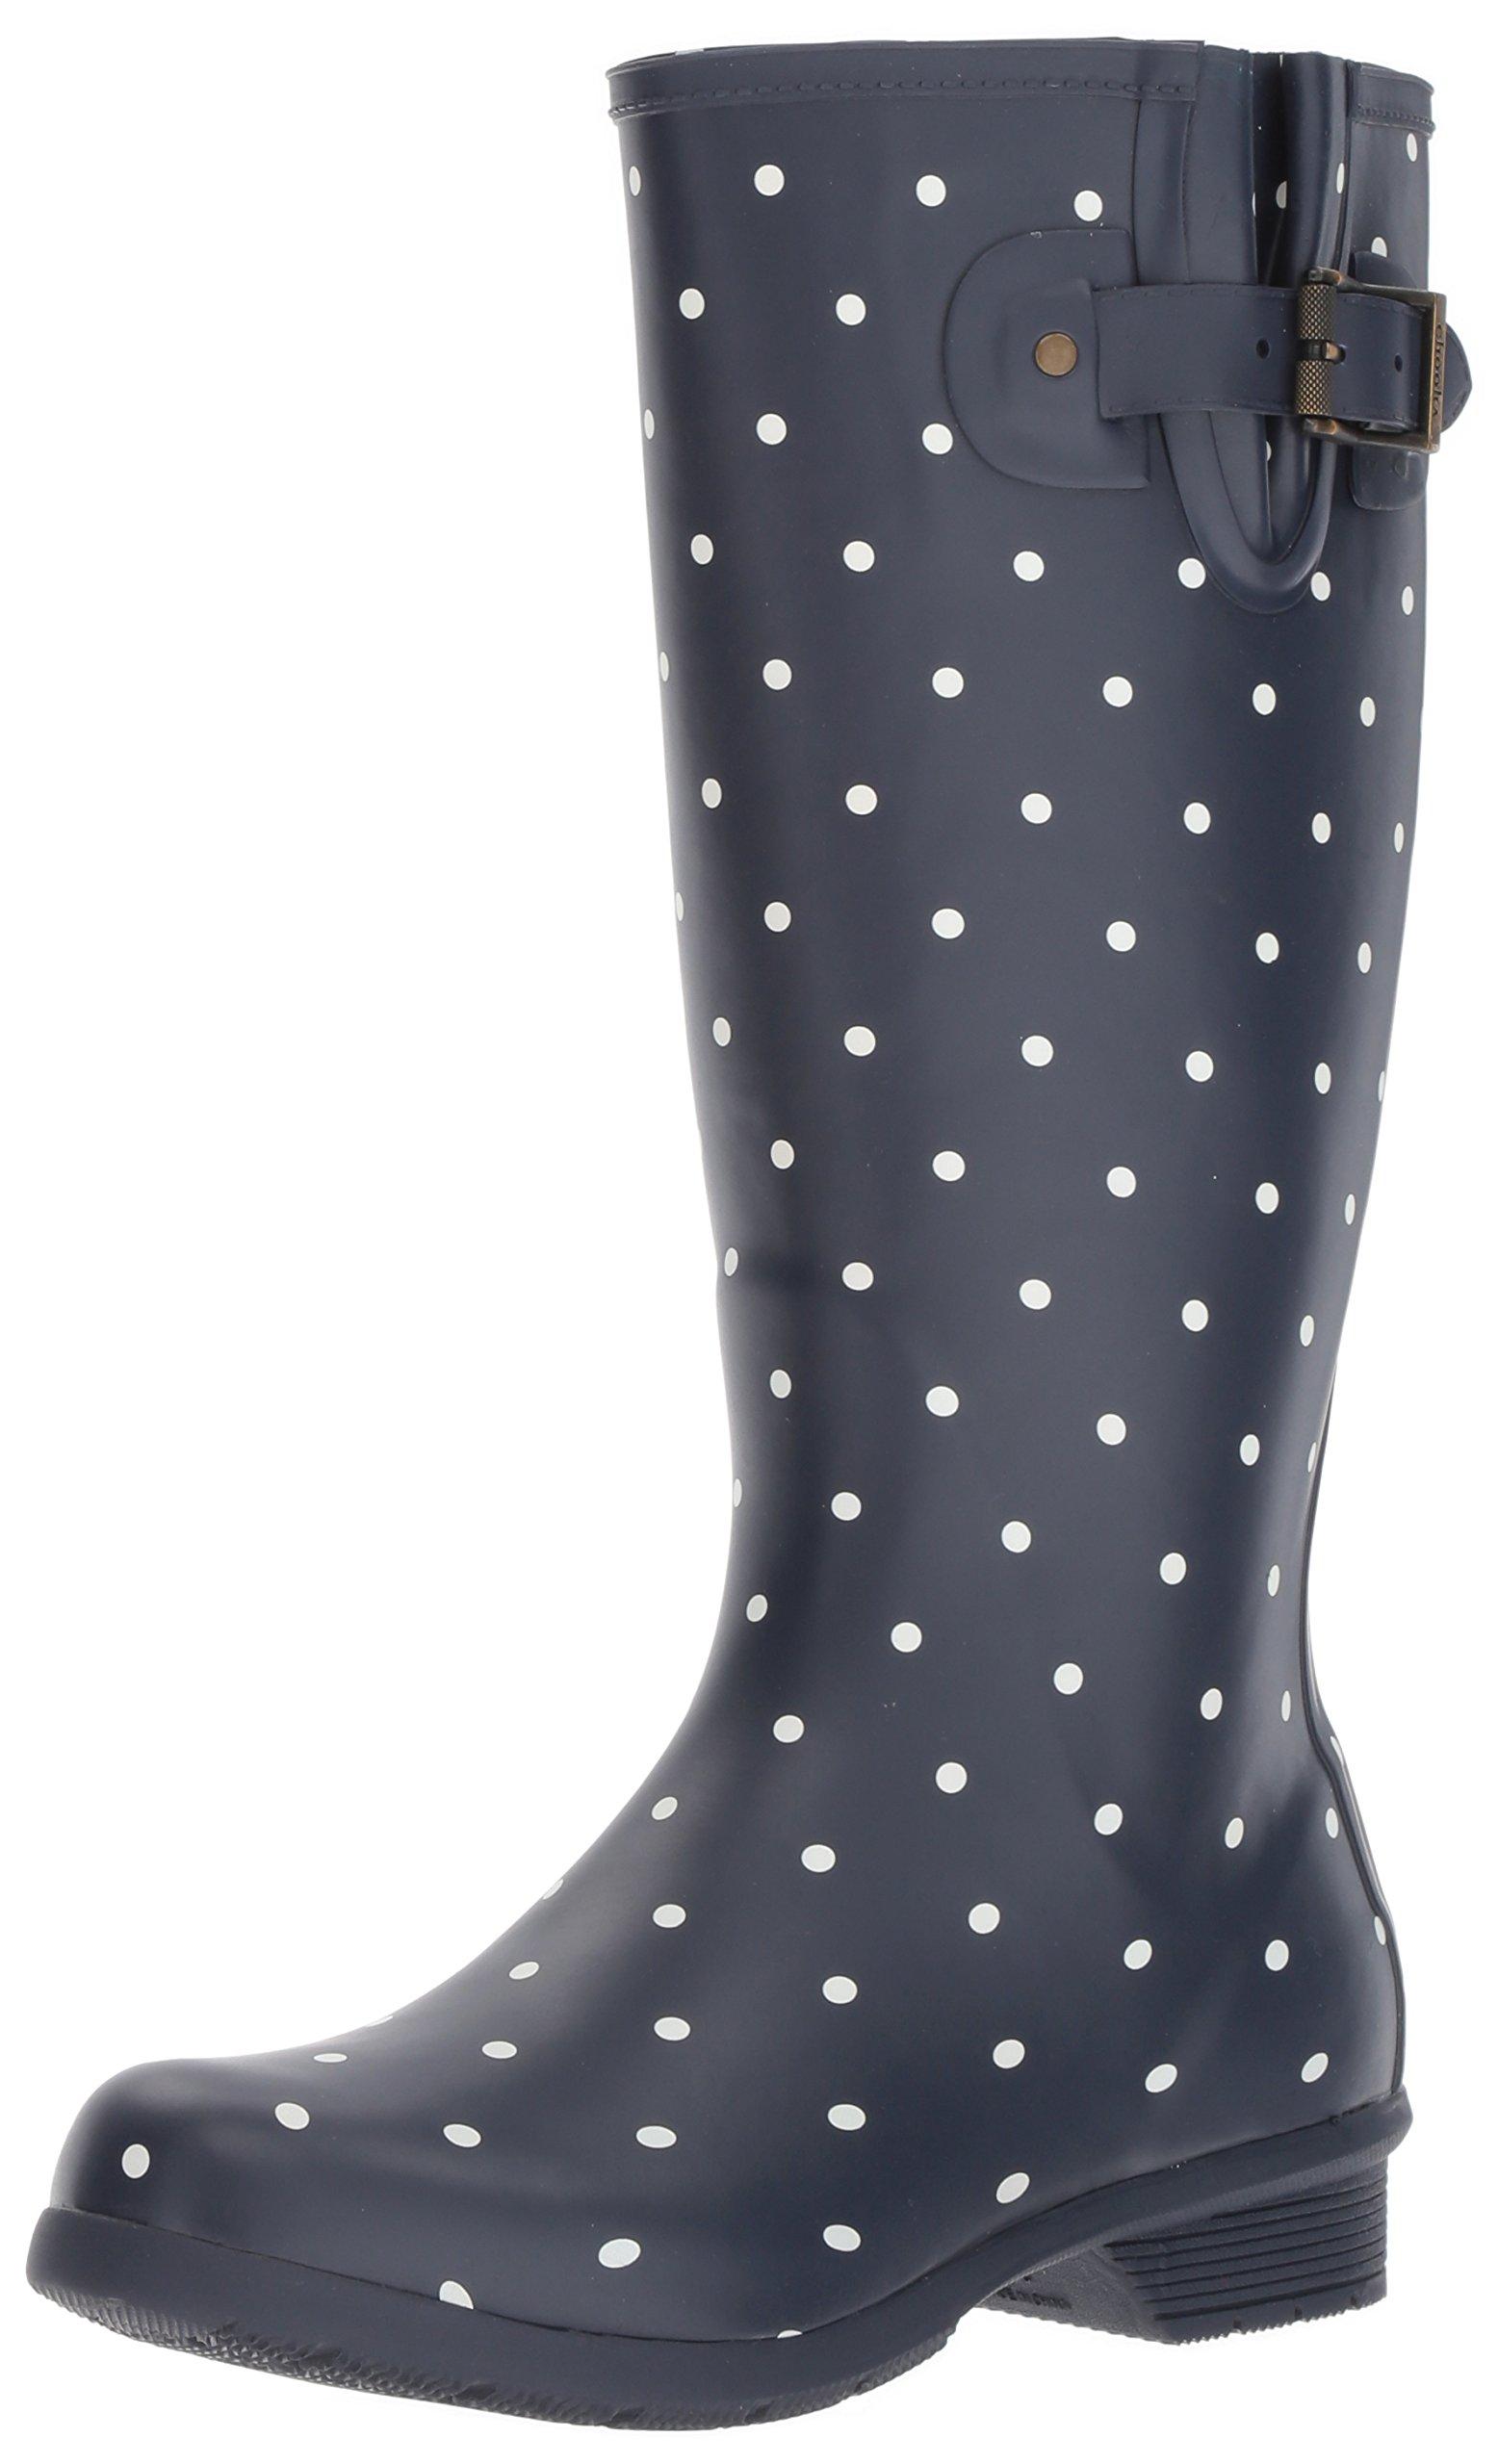 Chooka Women's Tall Memory Foam Rain Boot, Dot Blanc Navy, 9 M US